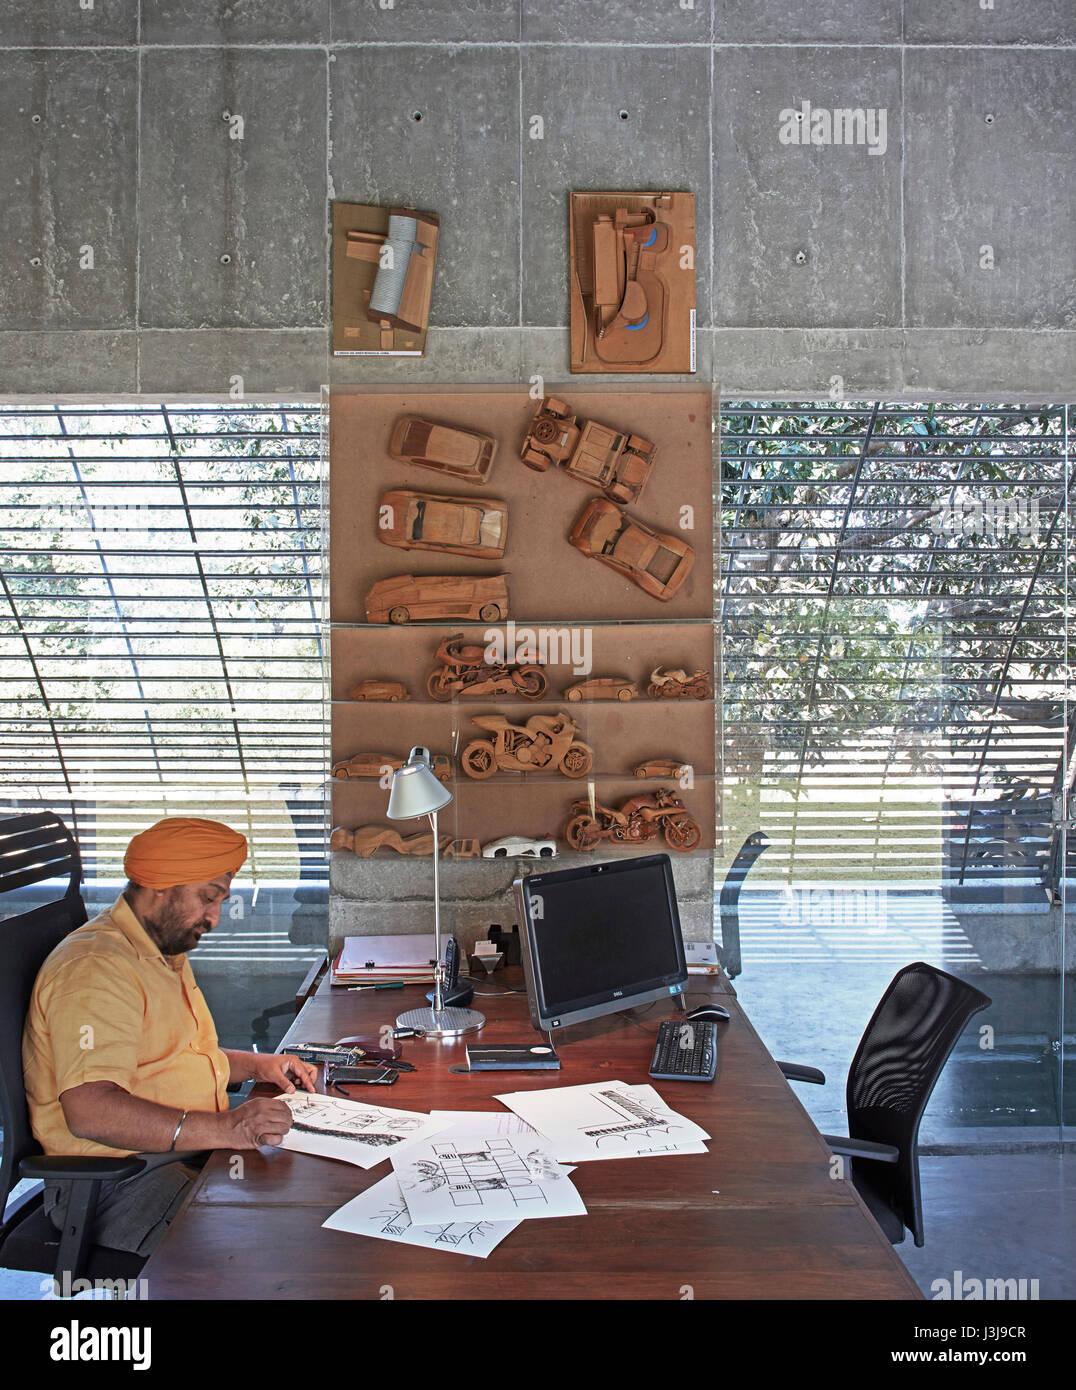 Studio view with design principle, Gurjit Matharoo at desk. The Pool Studio of Matharoo Associates, Ahmedabad, India. - Stock Image